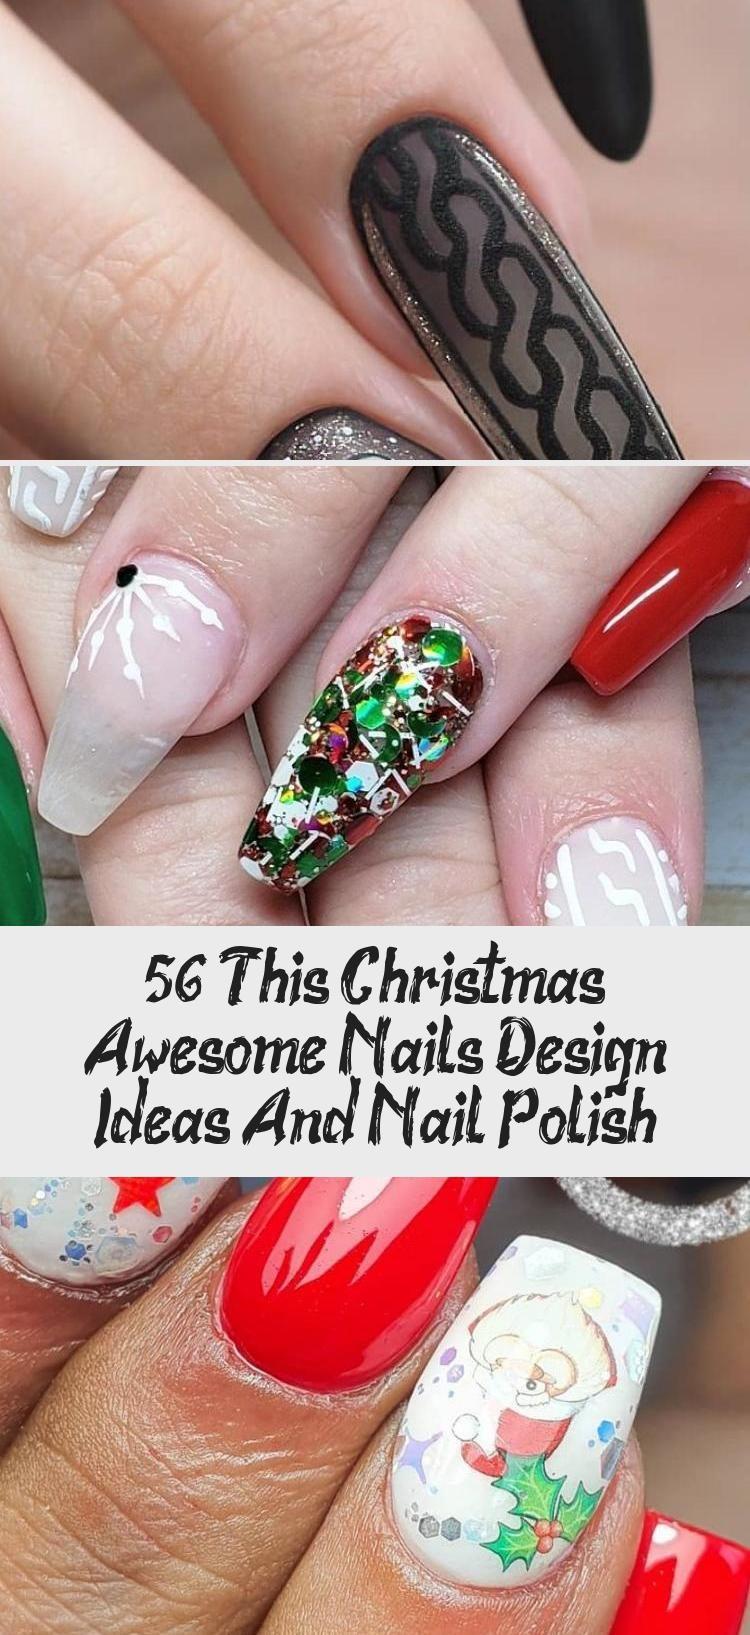 My Blog En Blog In 2020 Nail Designs Cool Nail Designs Beach Nail Designs